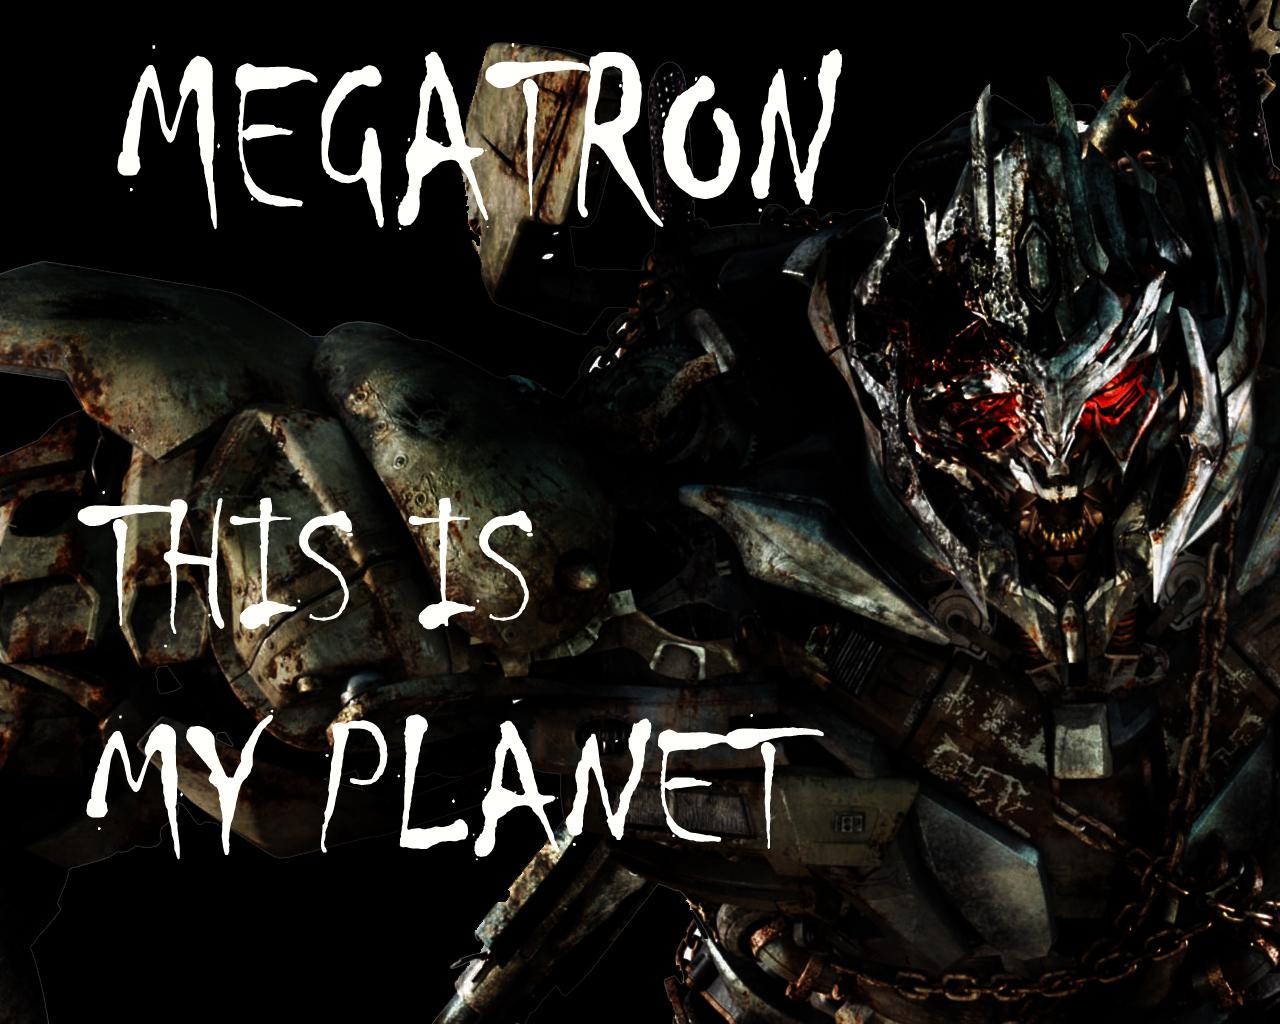 Megatron Wallpaper 5 by Lordstrscream94 on DeviantArt